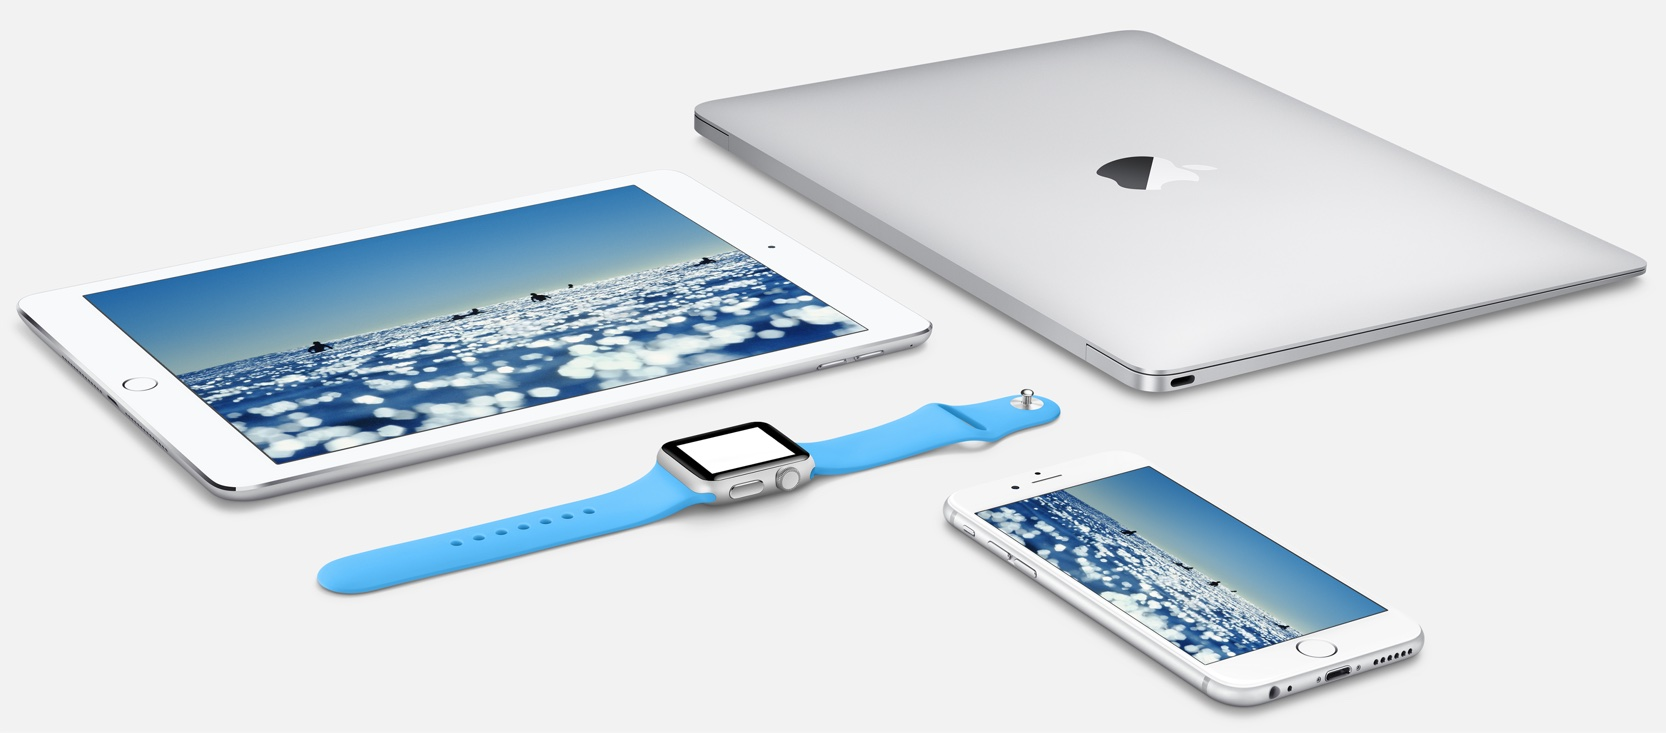 Apple-Watch-MacBook-Air-iPad-Air-iPhone-6-image-001